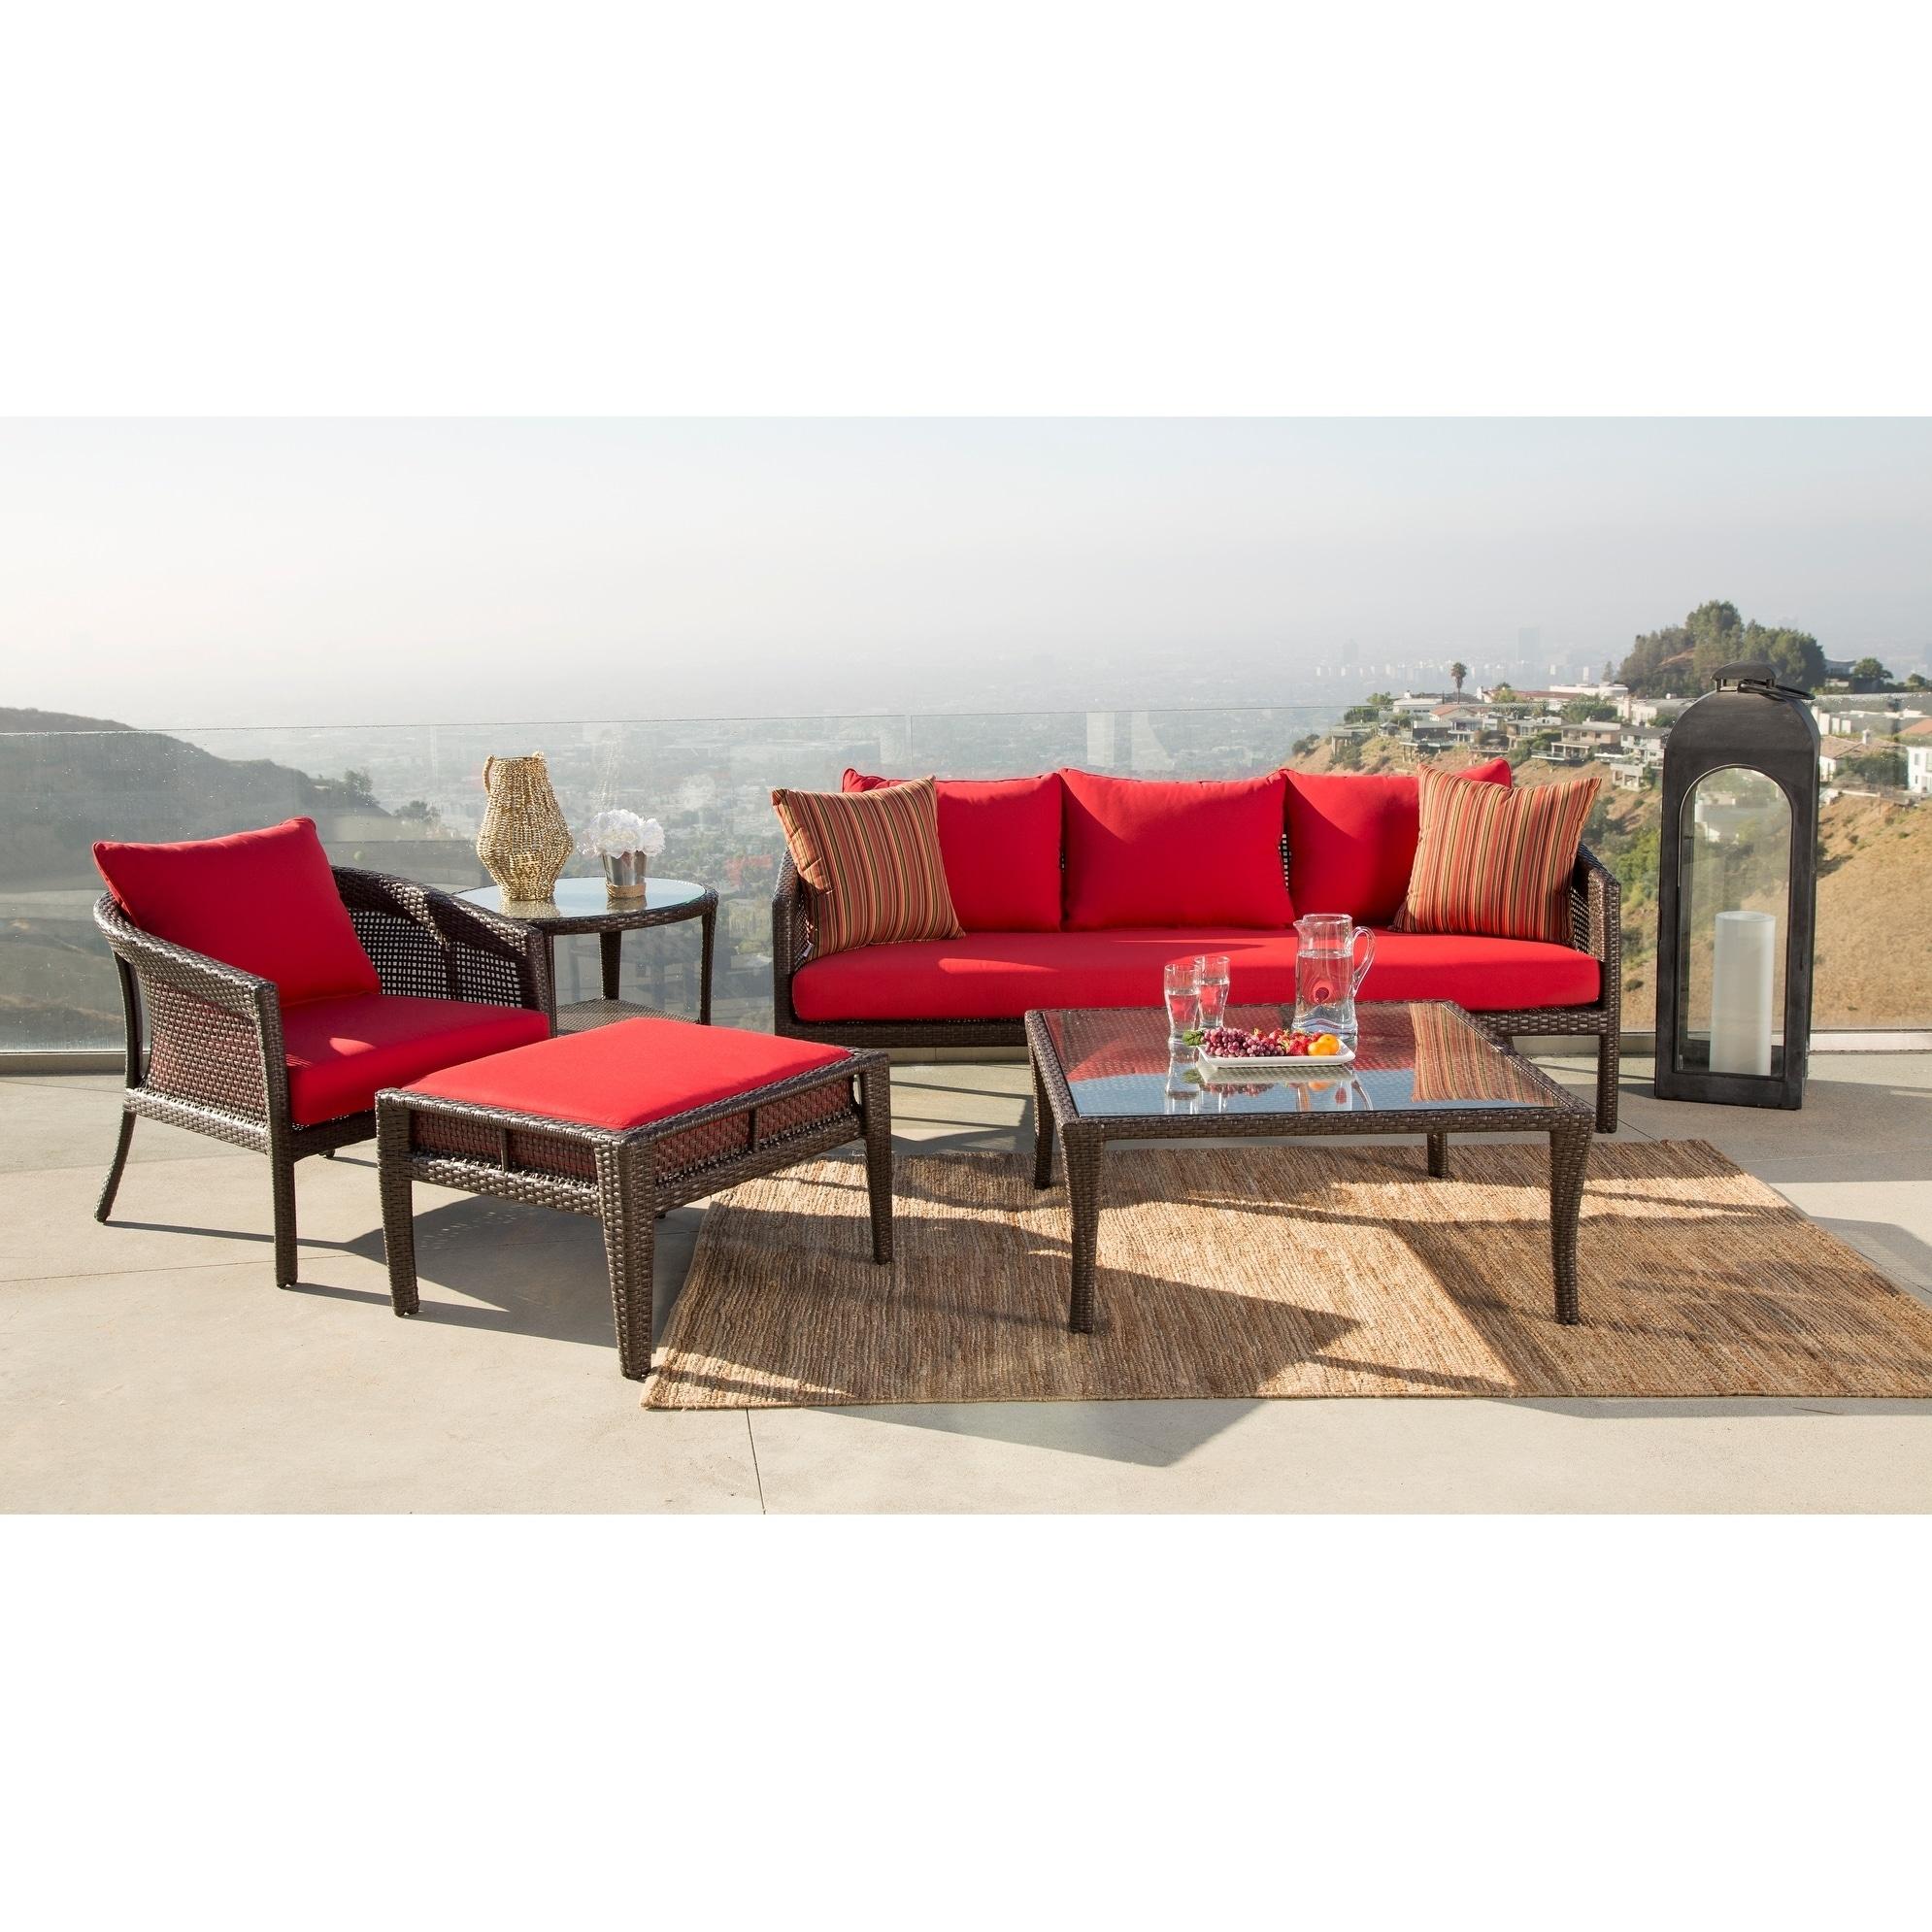 Abbyson santorini sunbrella red outdoor wicker 5 piece patio set